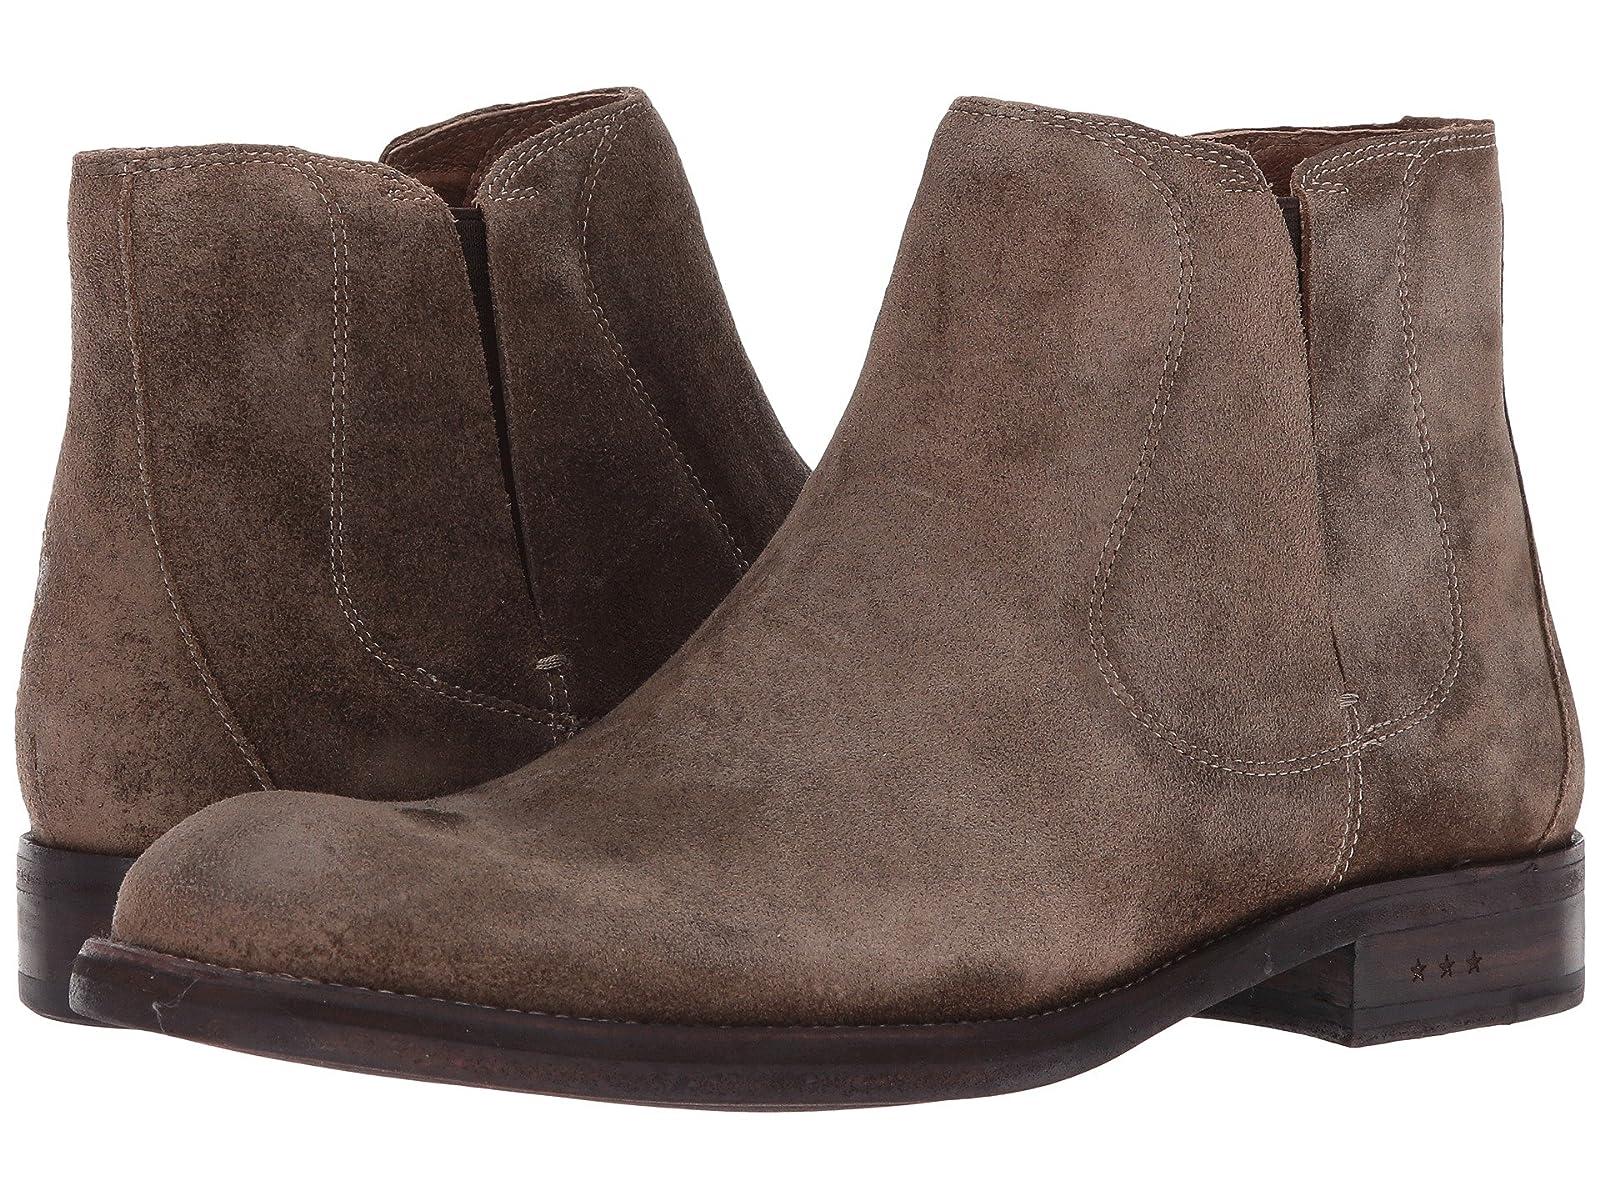 John Varvatos Waverly ChelseaCheap and distinctive eye-catching shoes